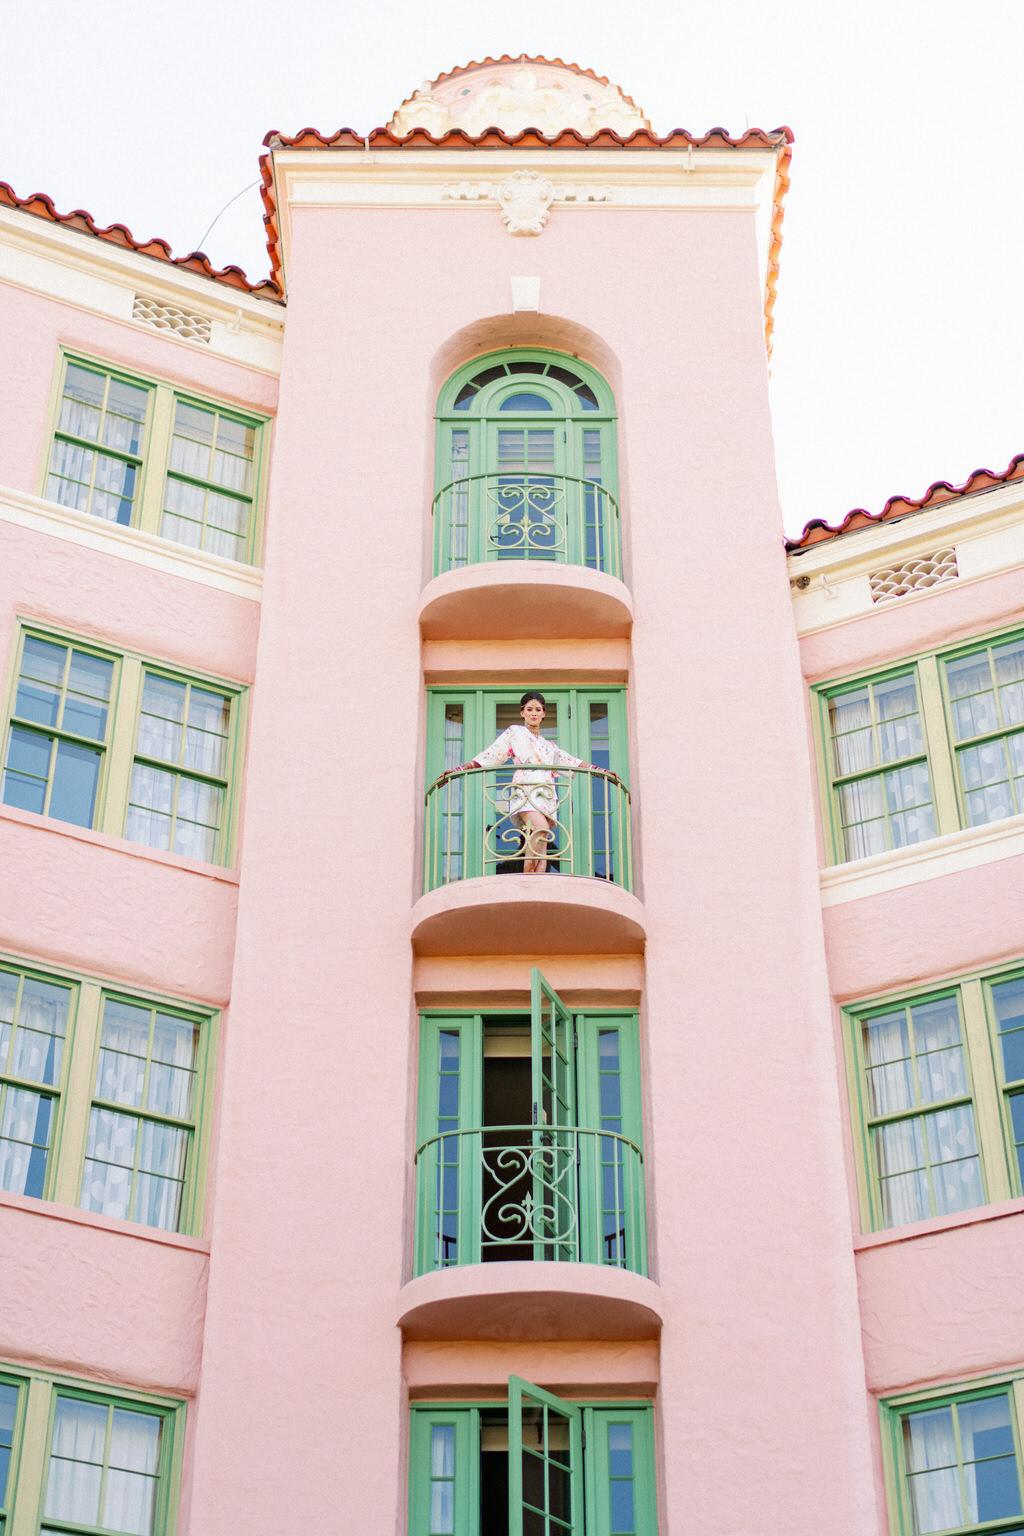 Bride on Balcony of Tropical, Florida Resort Waterfront Wedding Venue | The Vinoy Renaissance St. Petersburg Resort & Golf Club